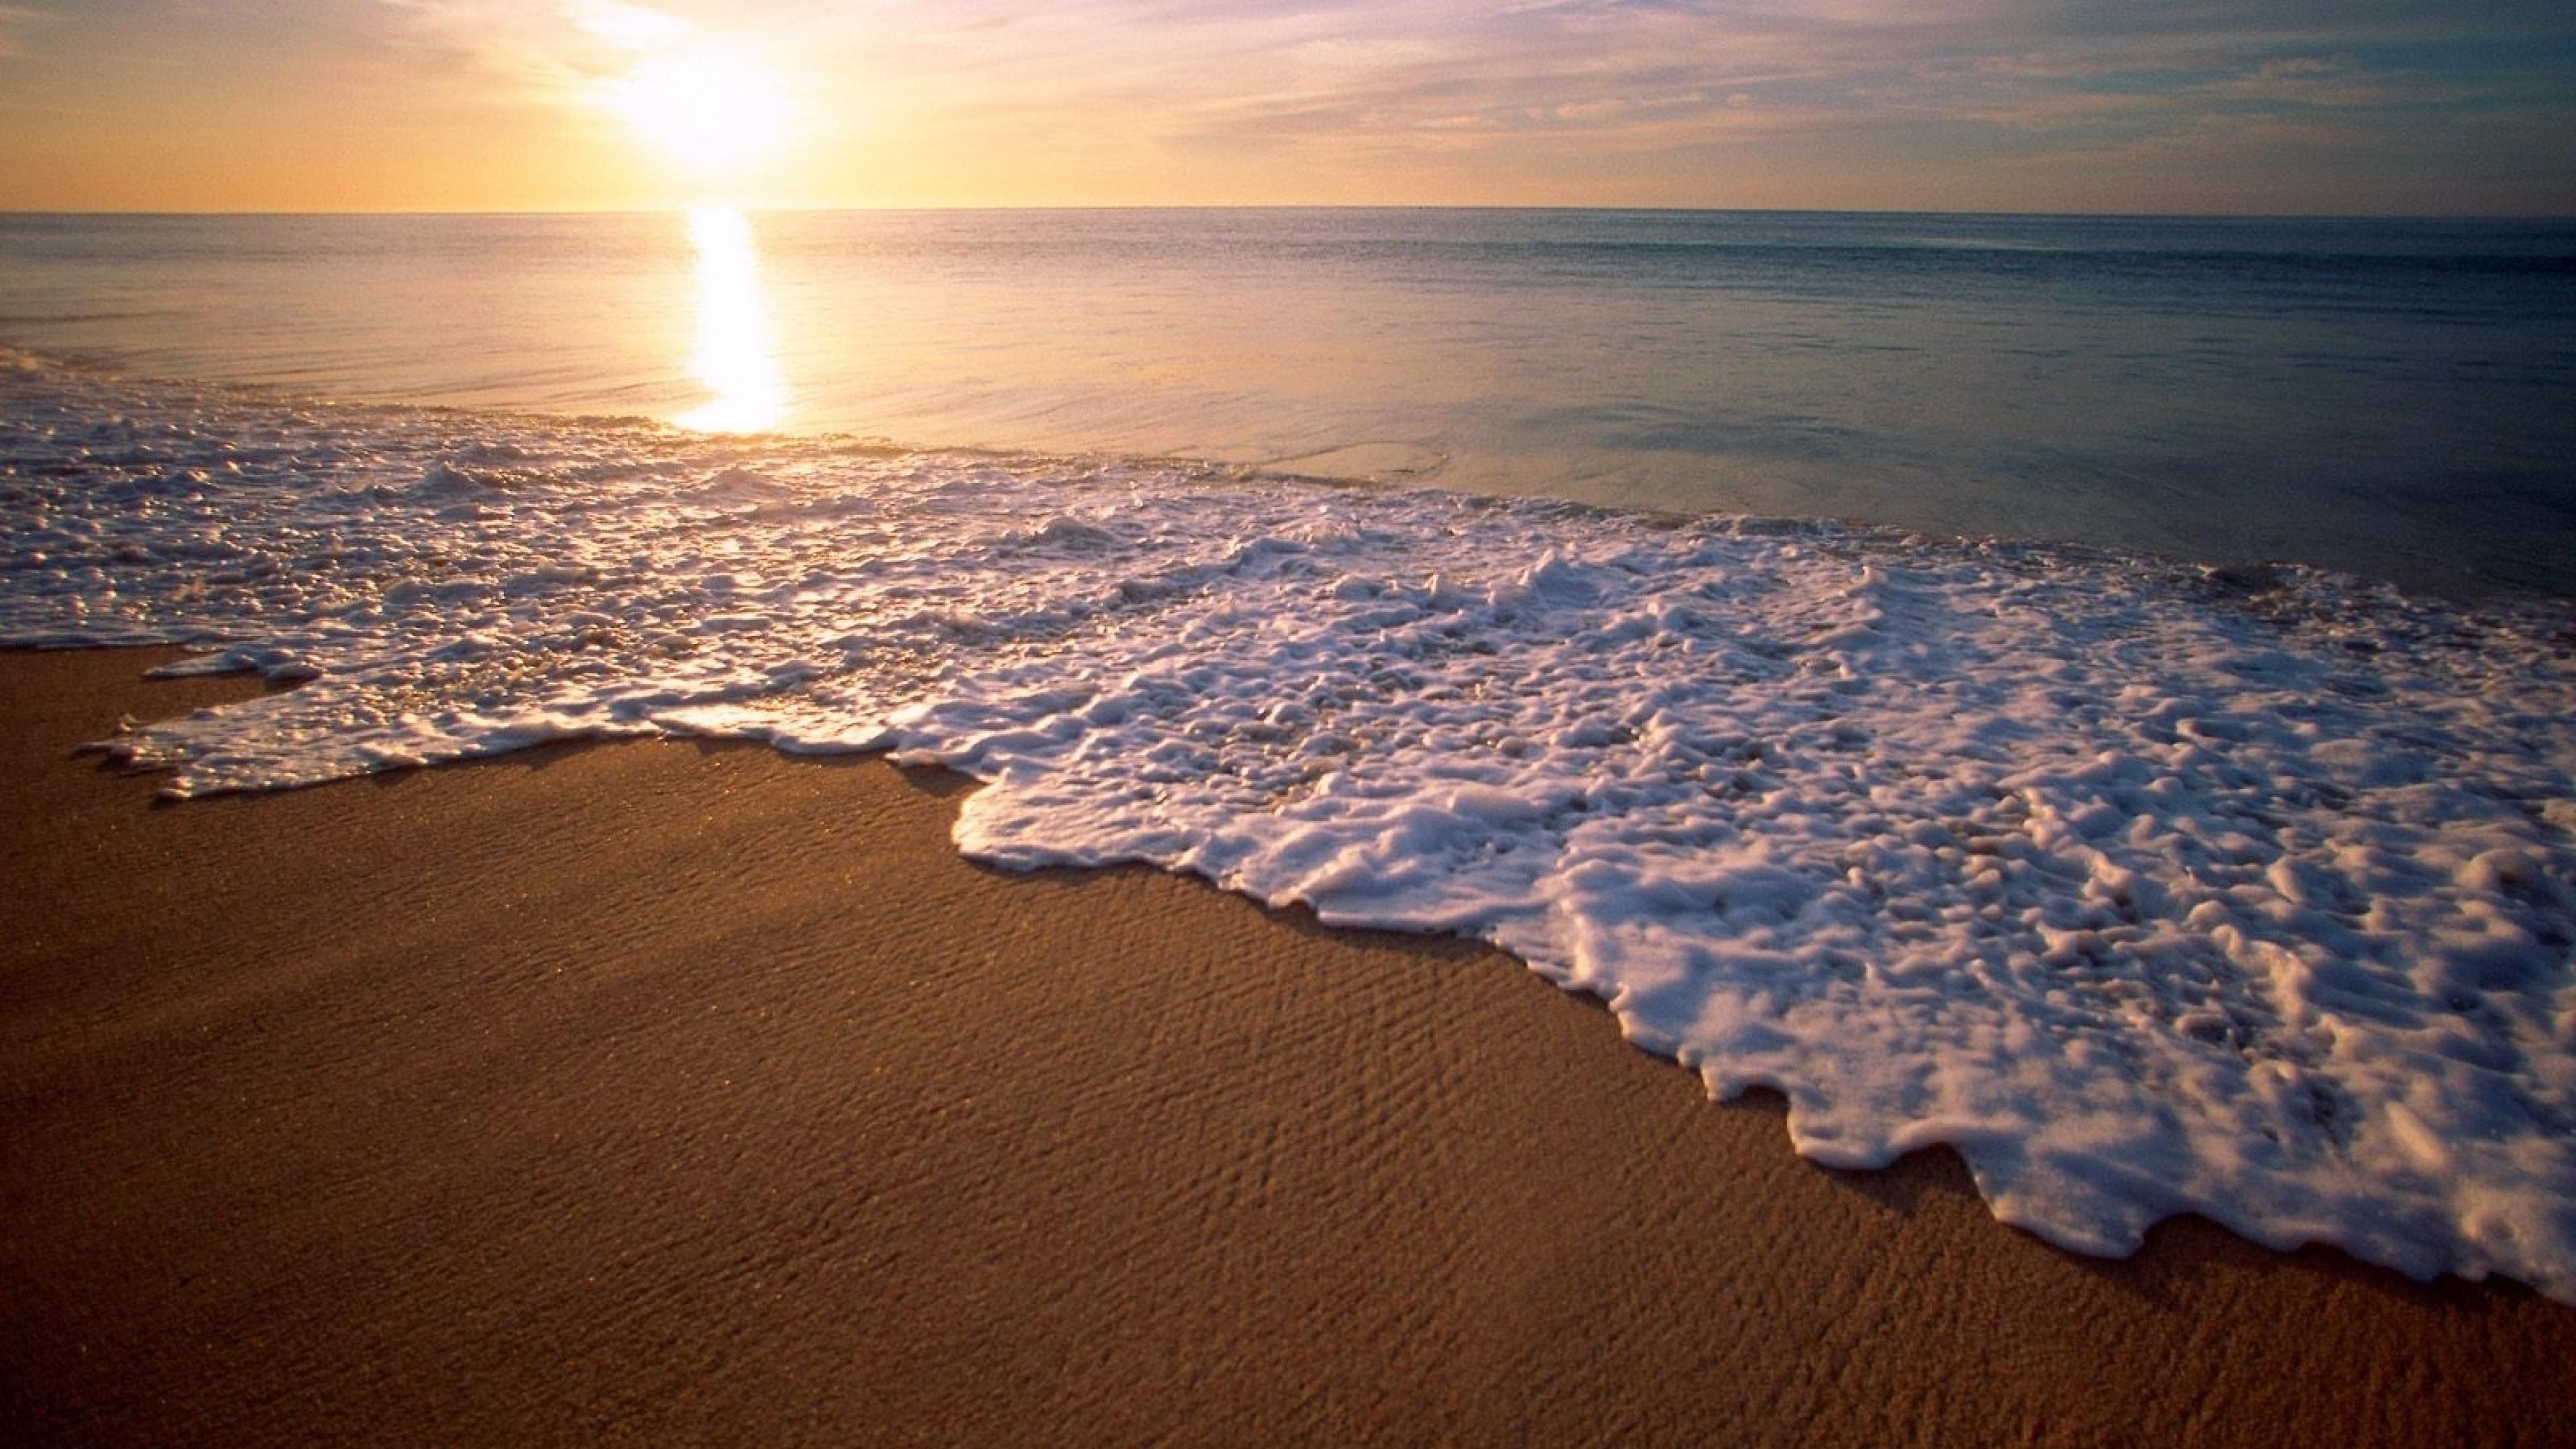 Preview wallpaper mexico city, california, beach, wave, foam, sand, evening